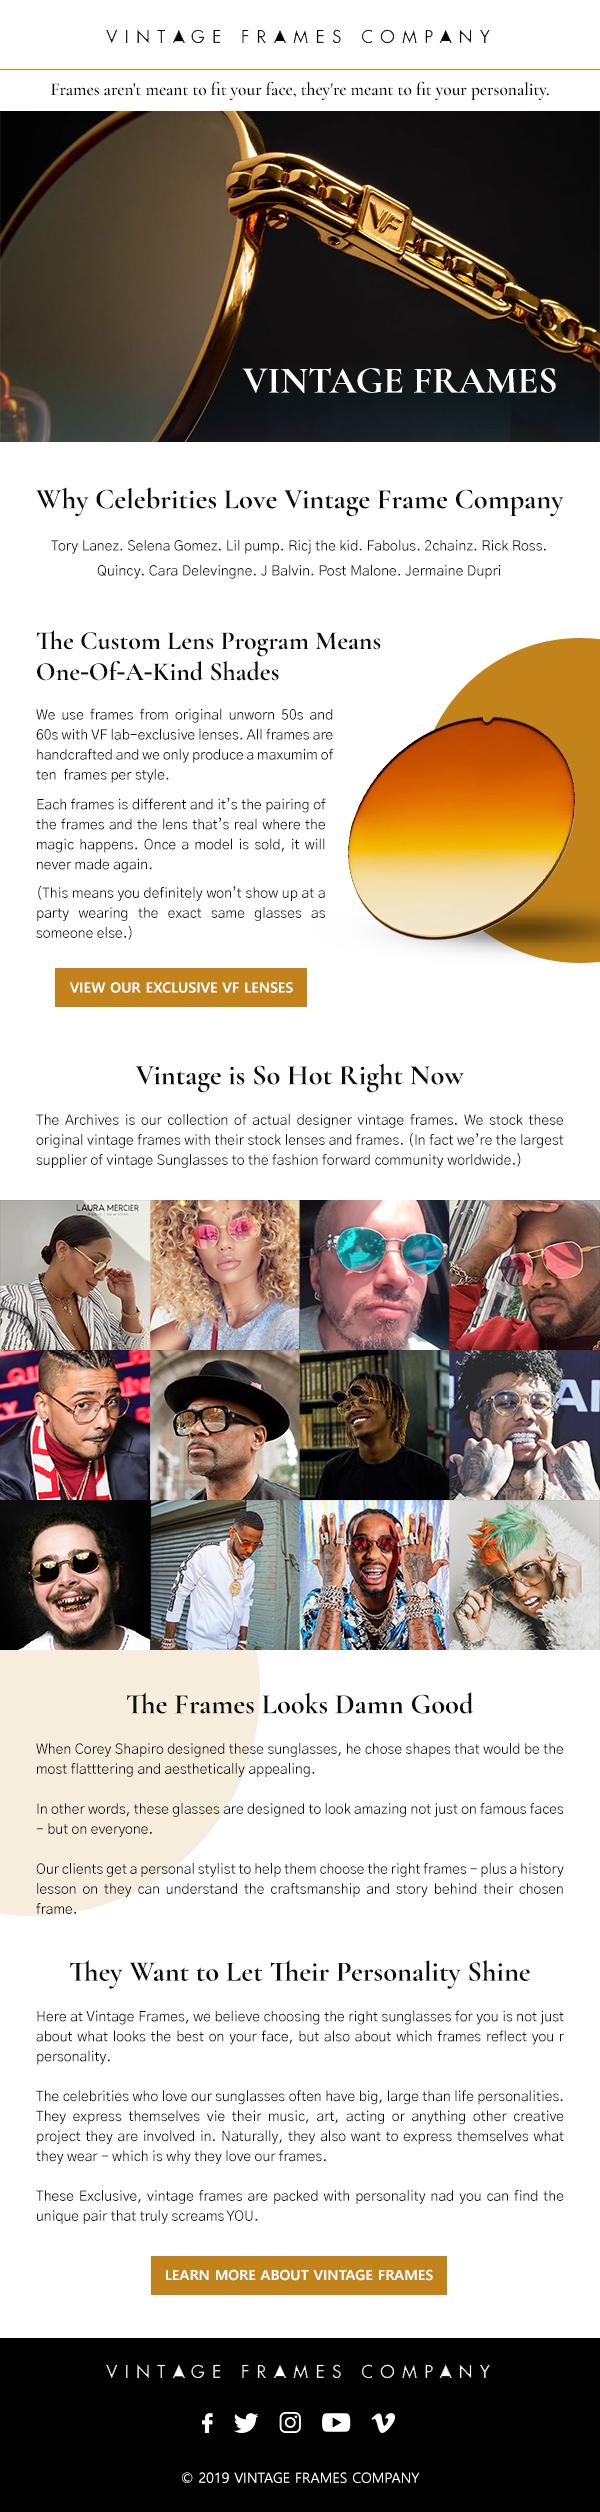 Email Design for Luxury Eyewear Brand